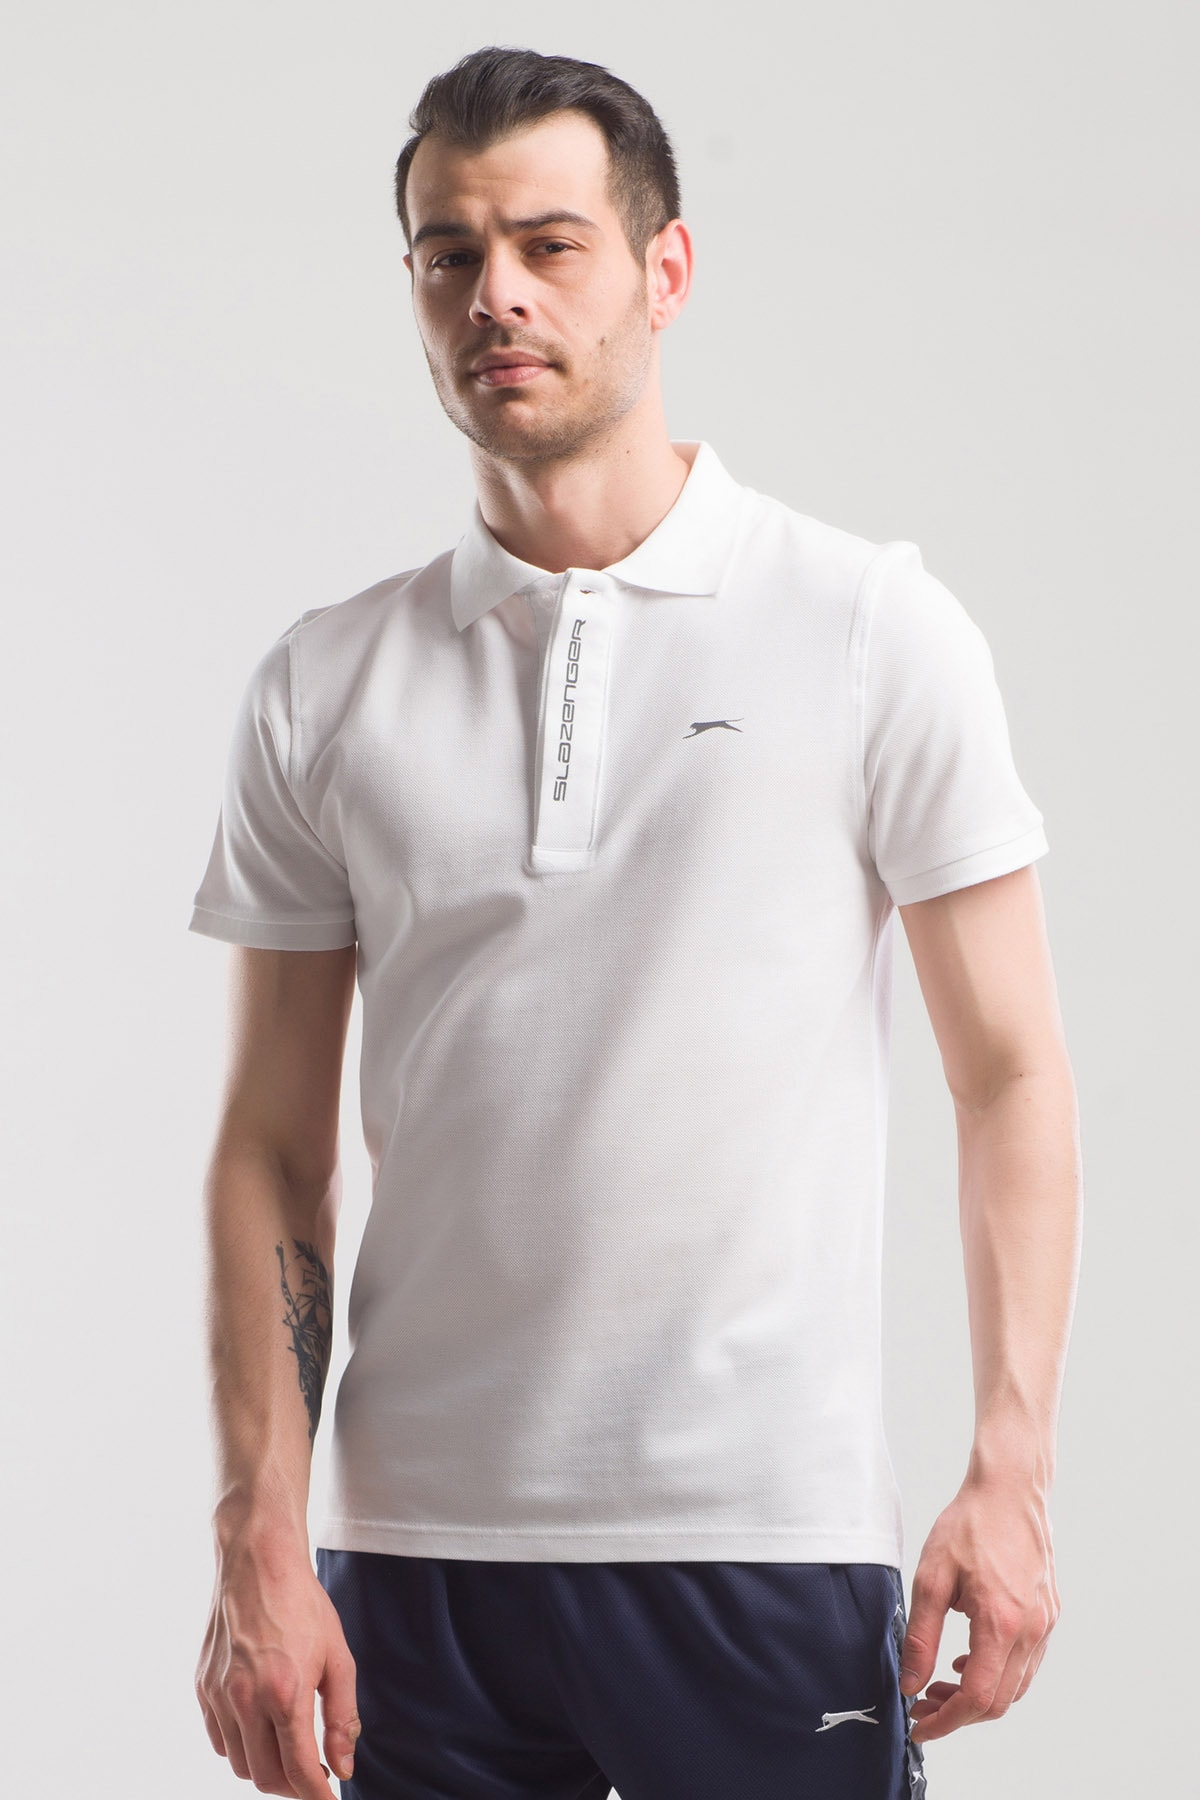 Slazenger Platon Erkek T-shirt Beyaz 1